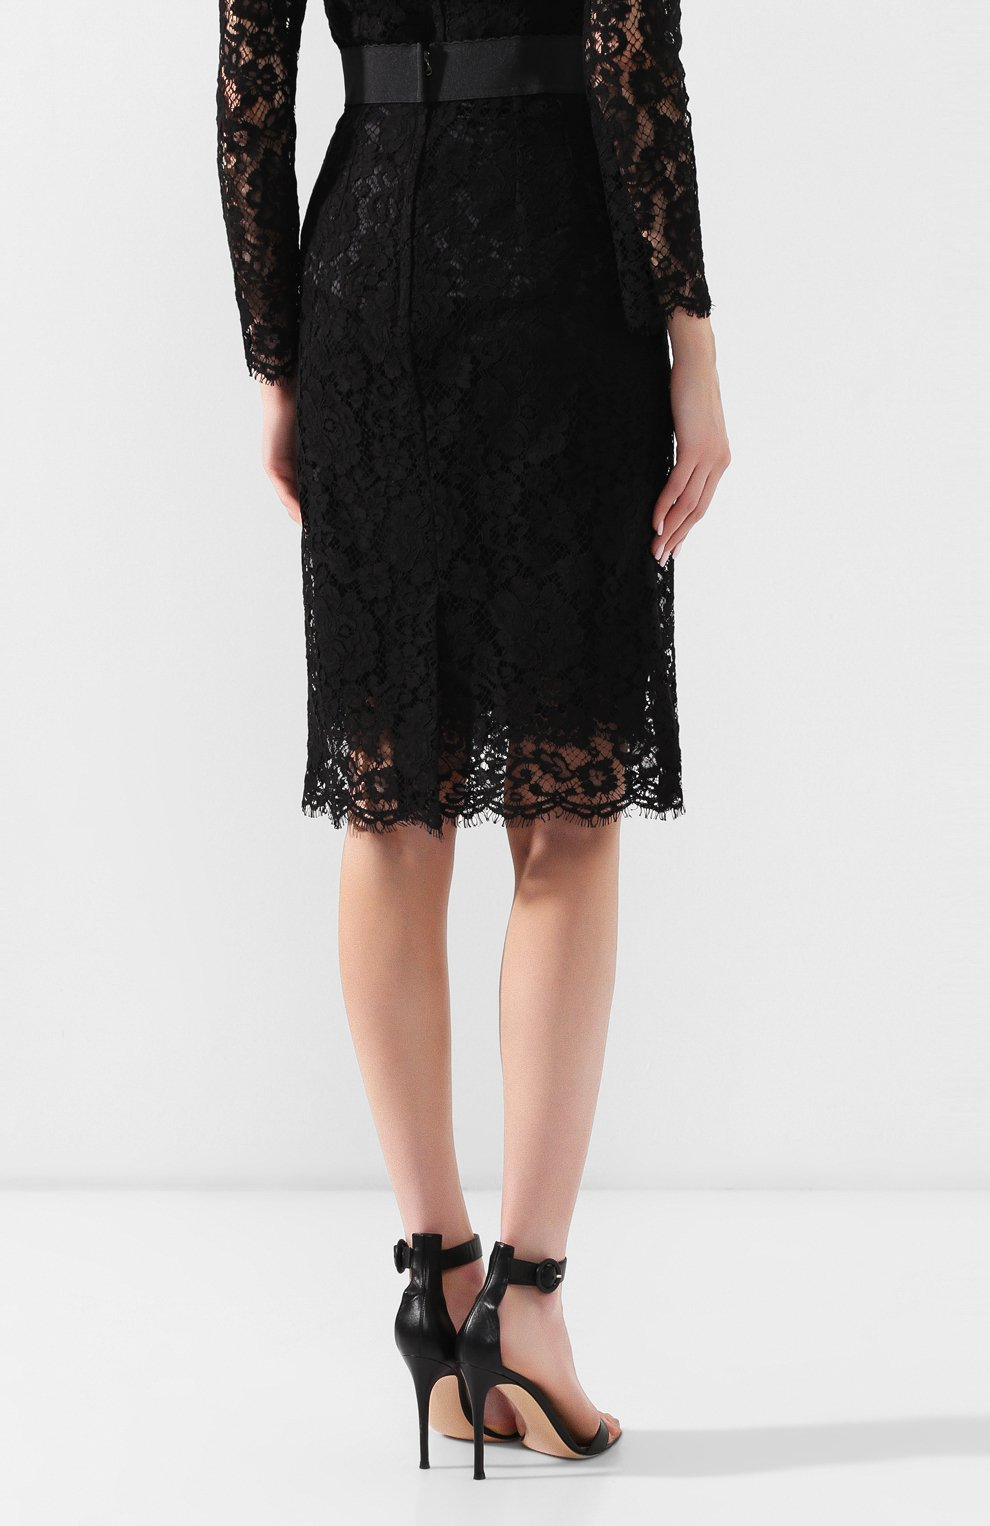 Кружевная юбка | Фото №4